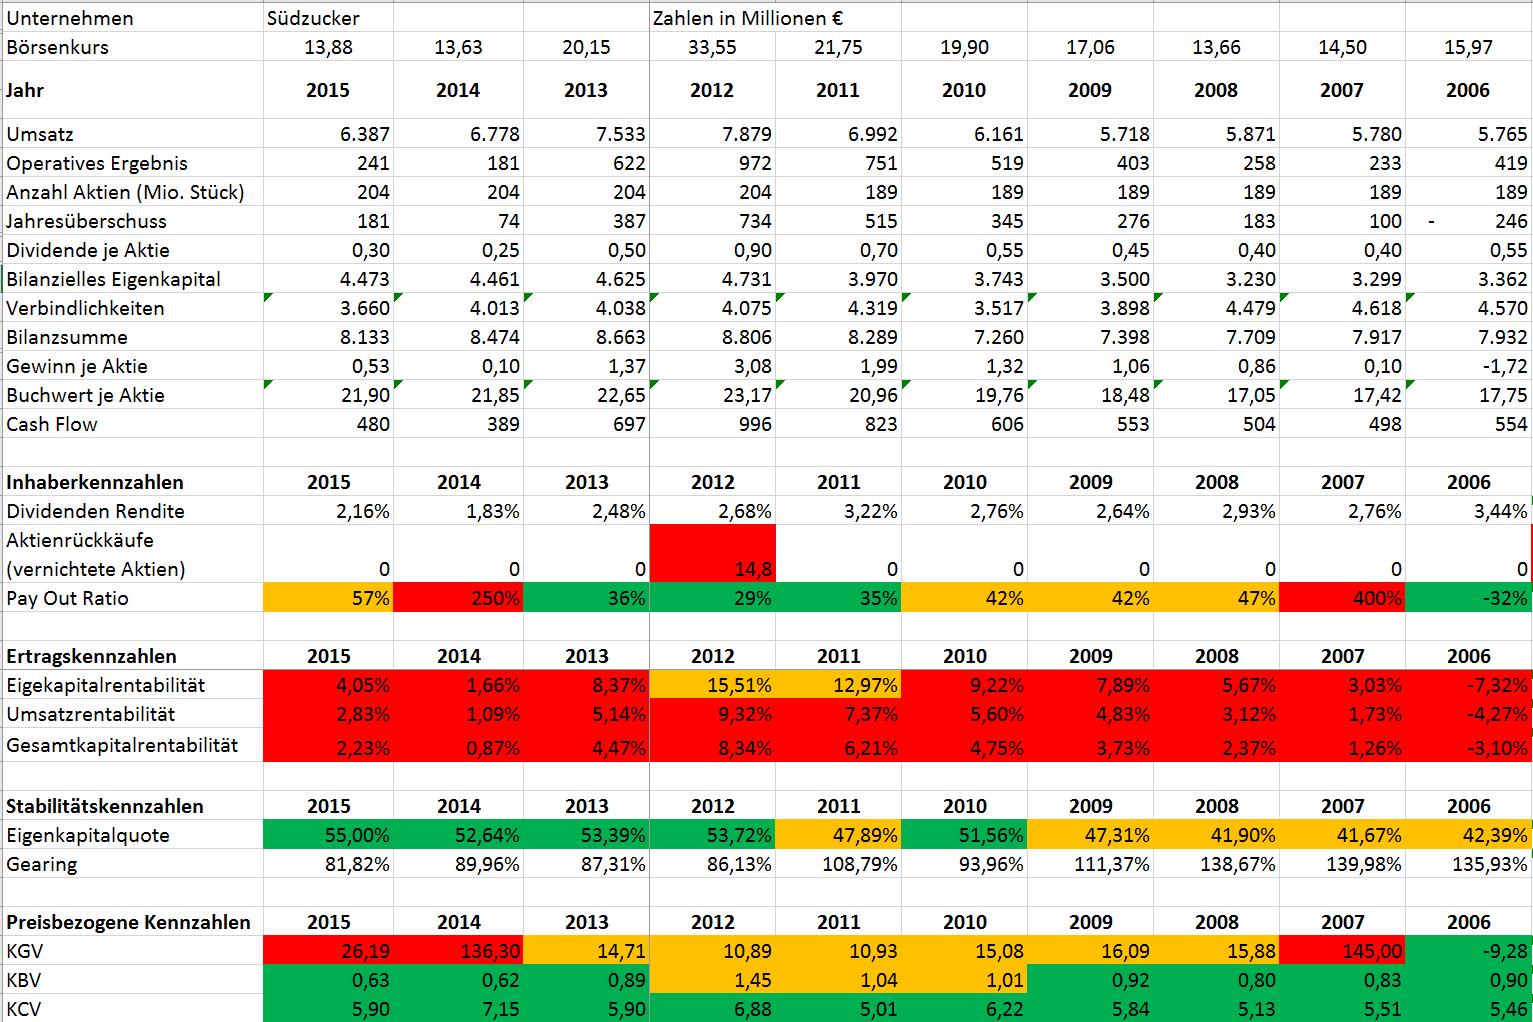 Unternehmensanalyse Südzucker